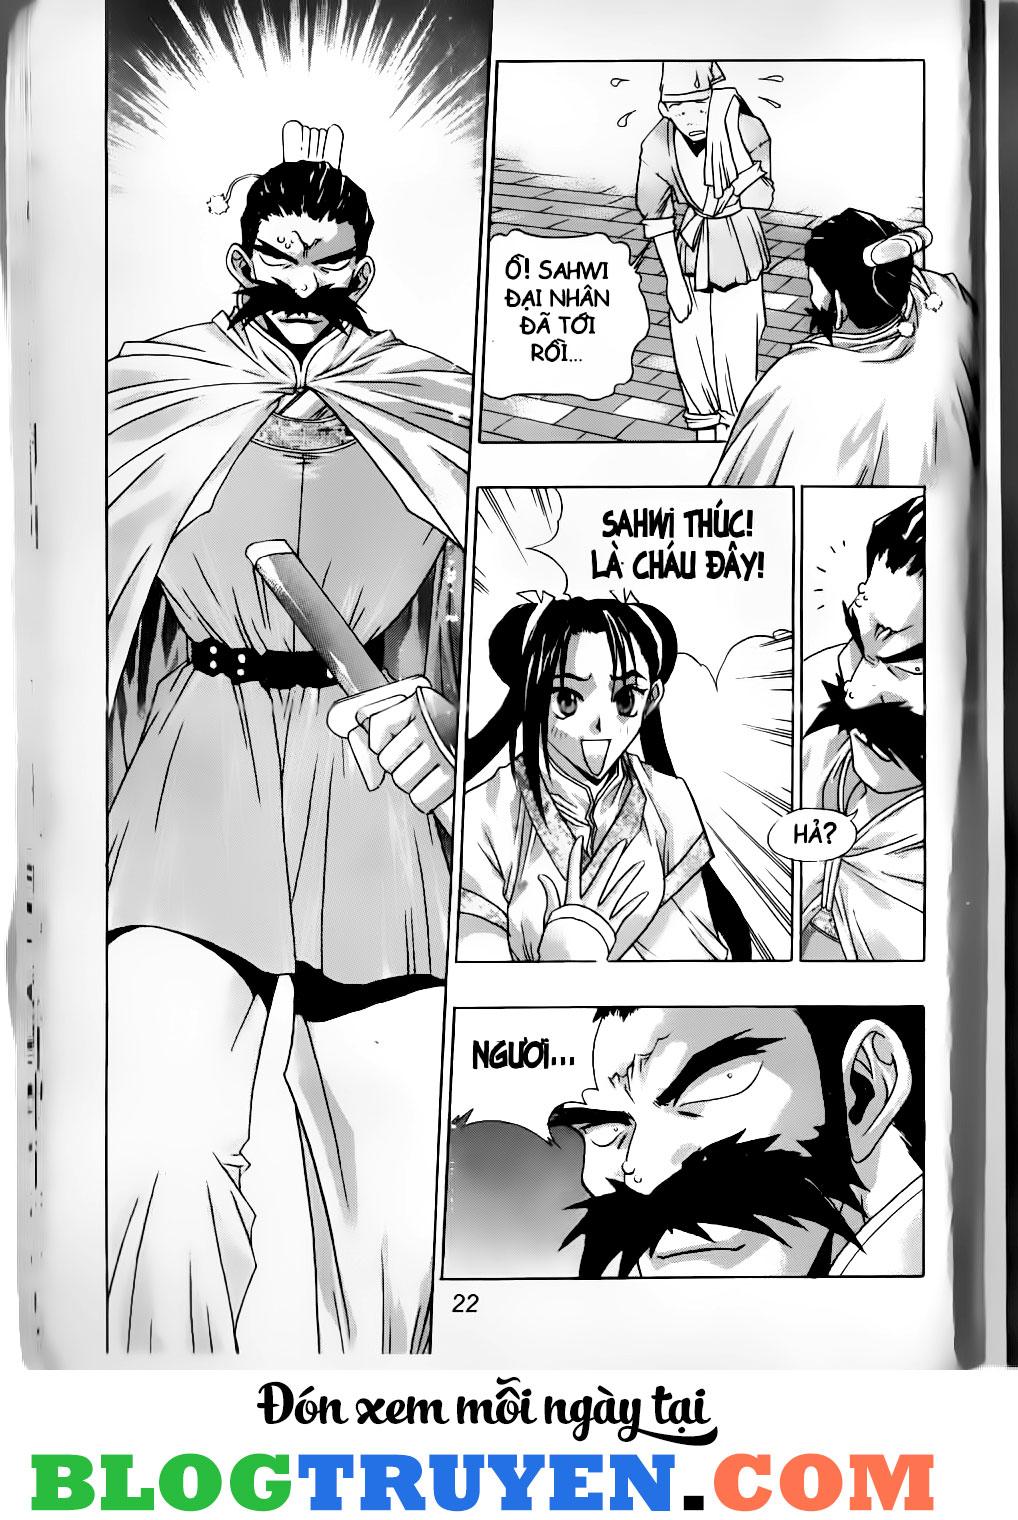 Thiên Lang Liệt Truyện Scan Chap 14 - Truyen.Chap.VN